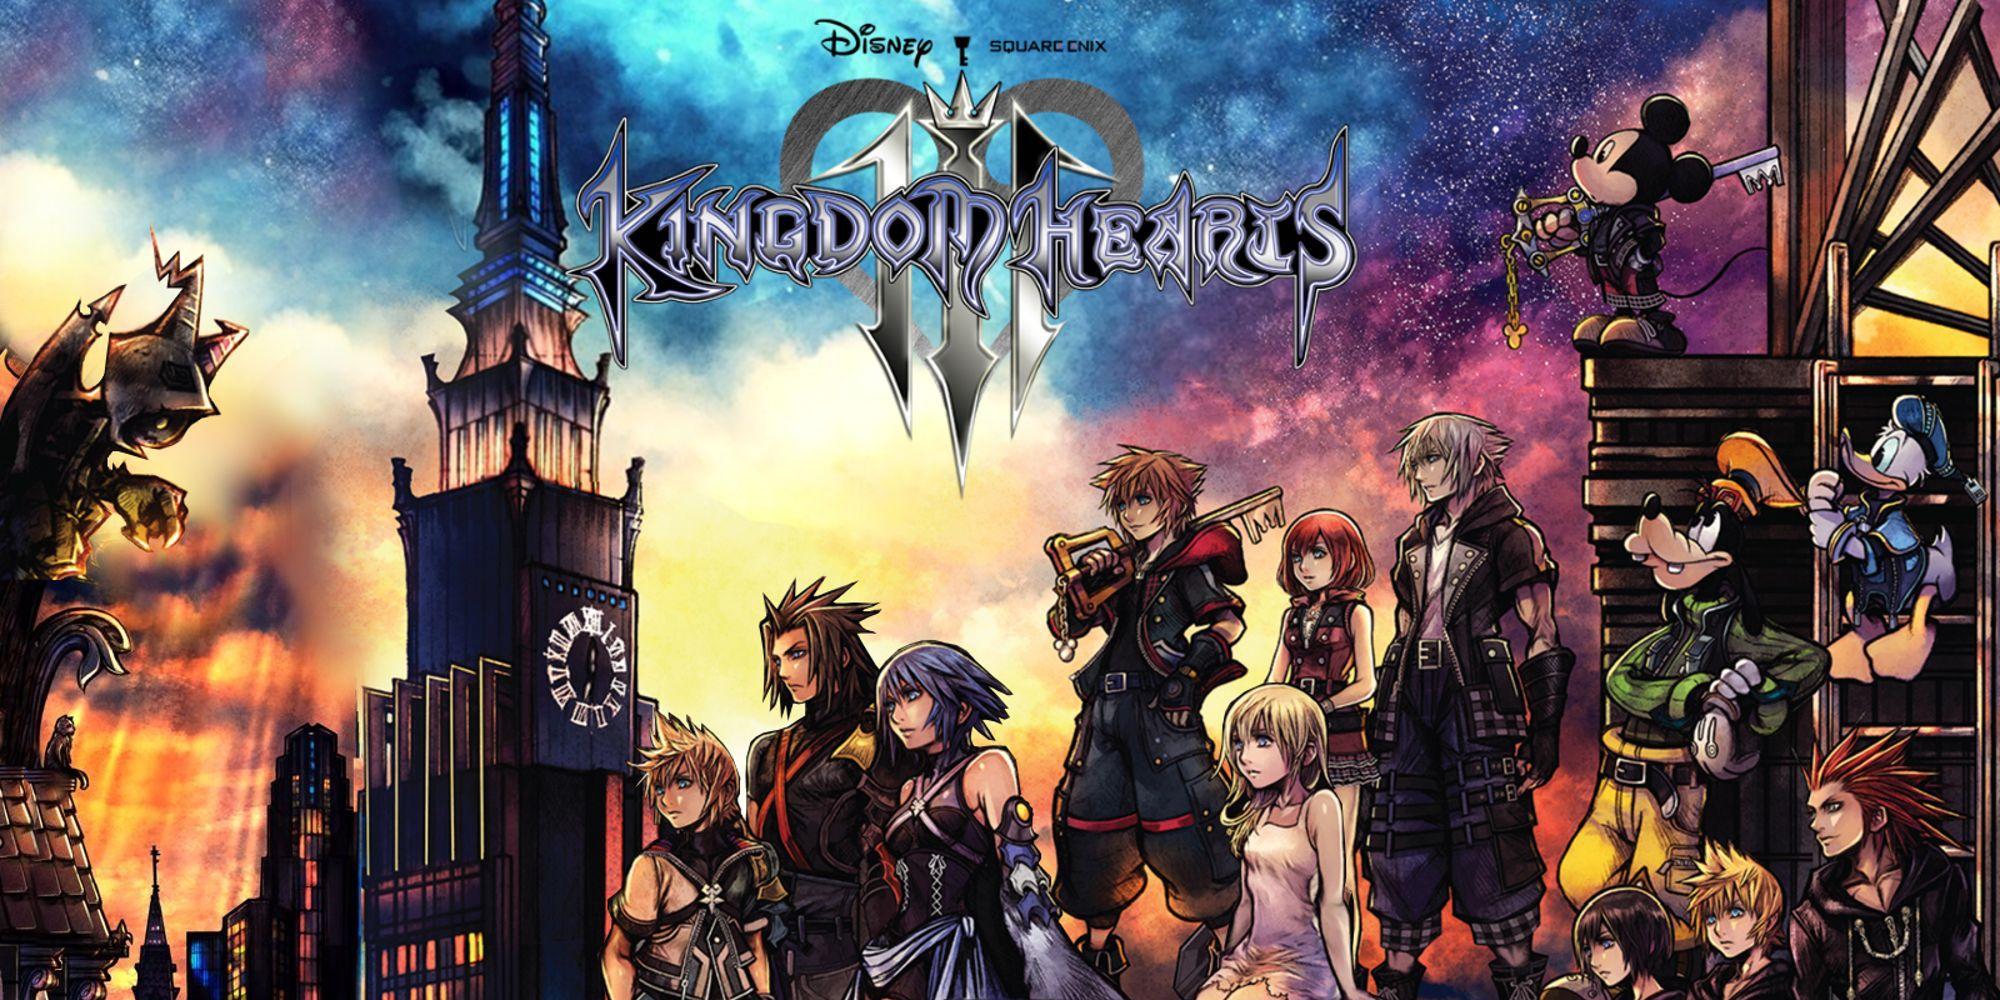 Today's Best Game Deals: Kingdom Hearts III $30, Rocket League $6.50, more